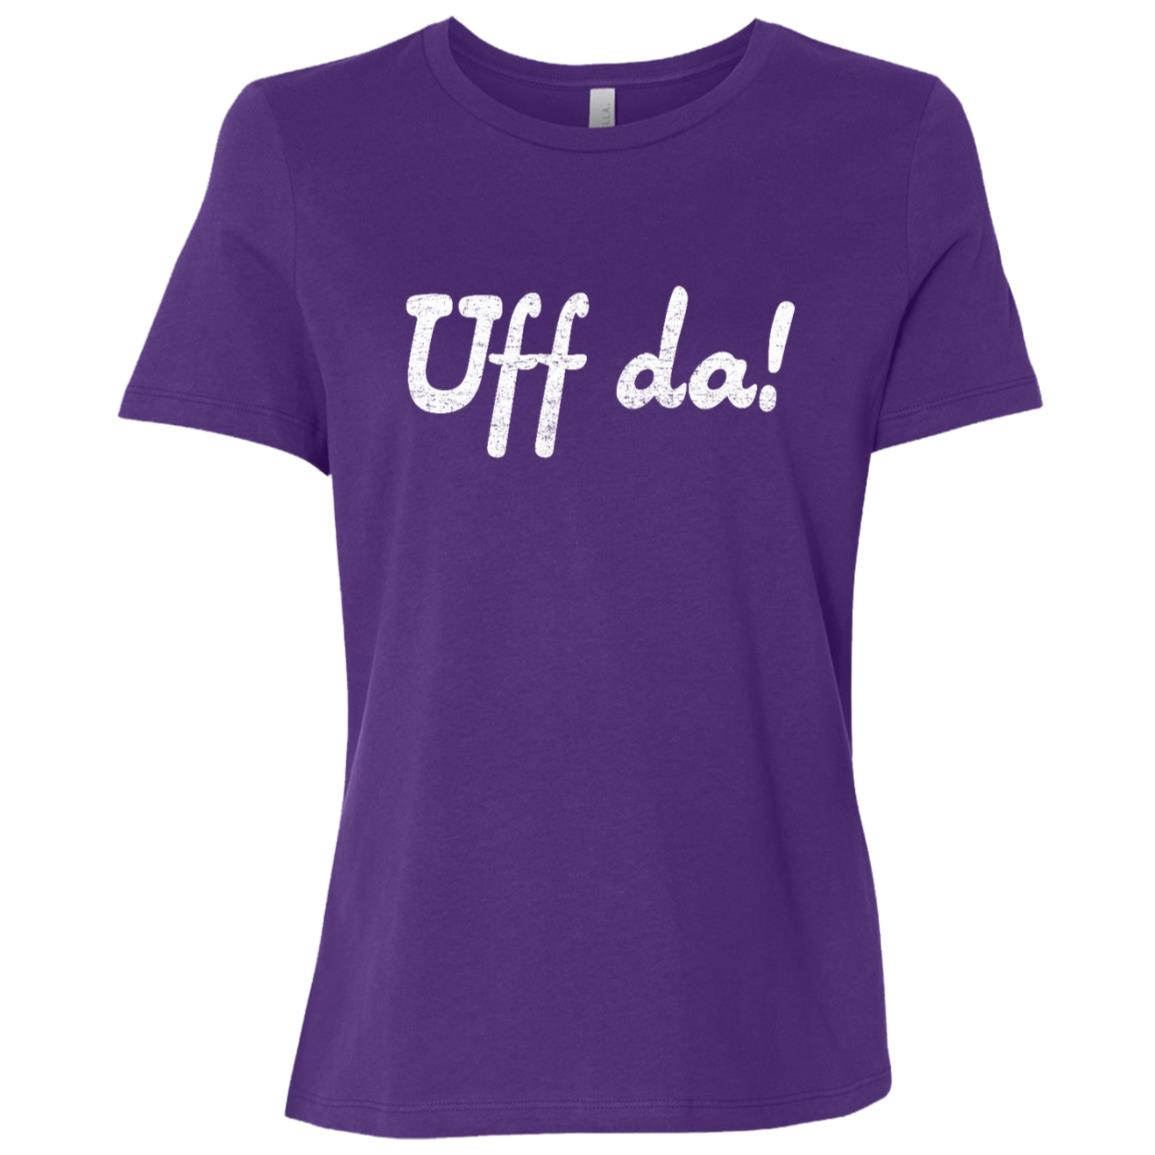 Uff da funny minnesotan wisconsinite midwesterner -1 Women Short Sleeve T-Shirt